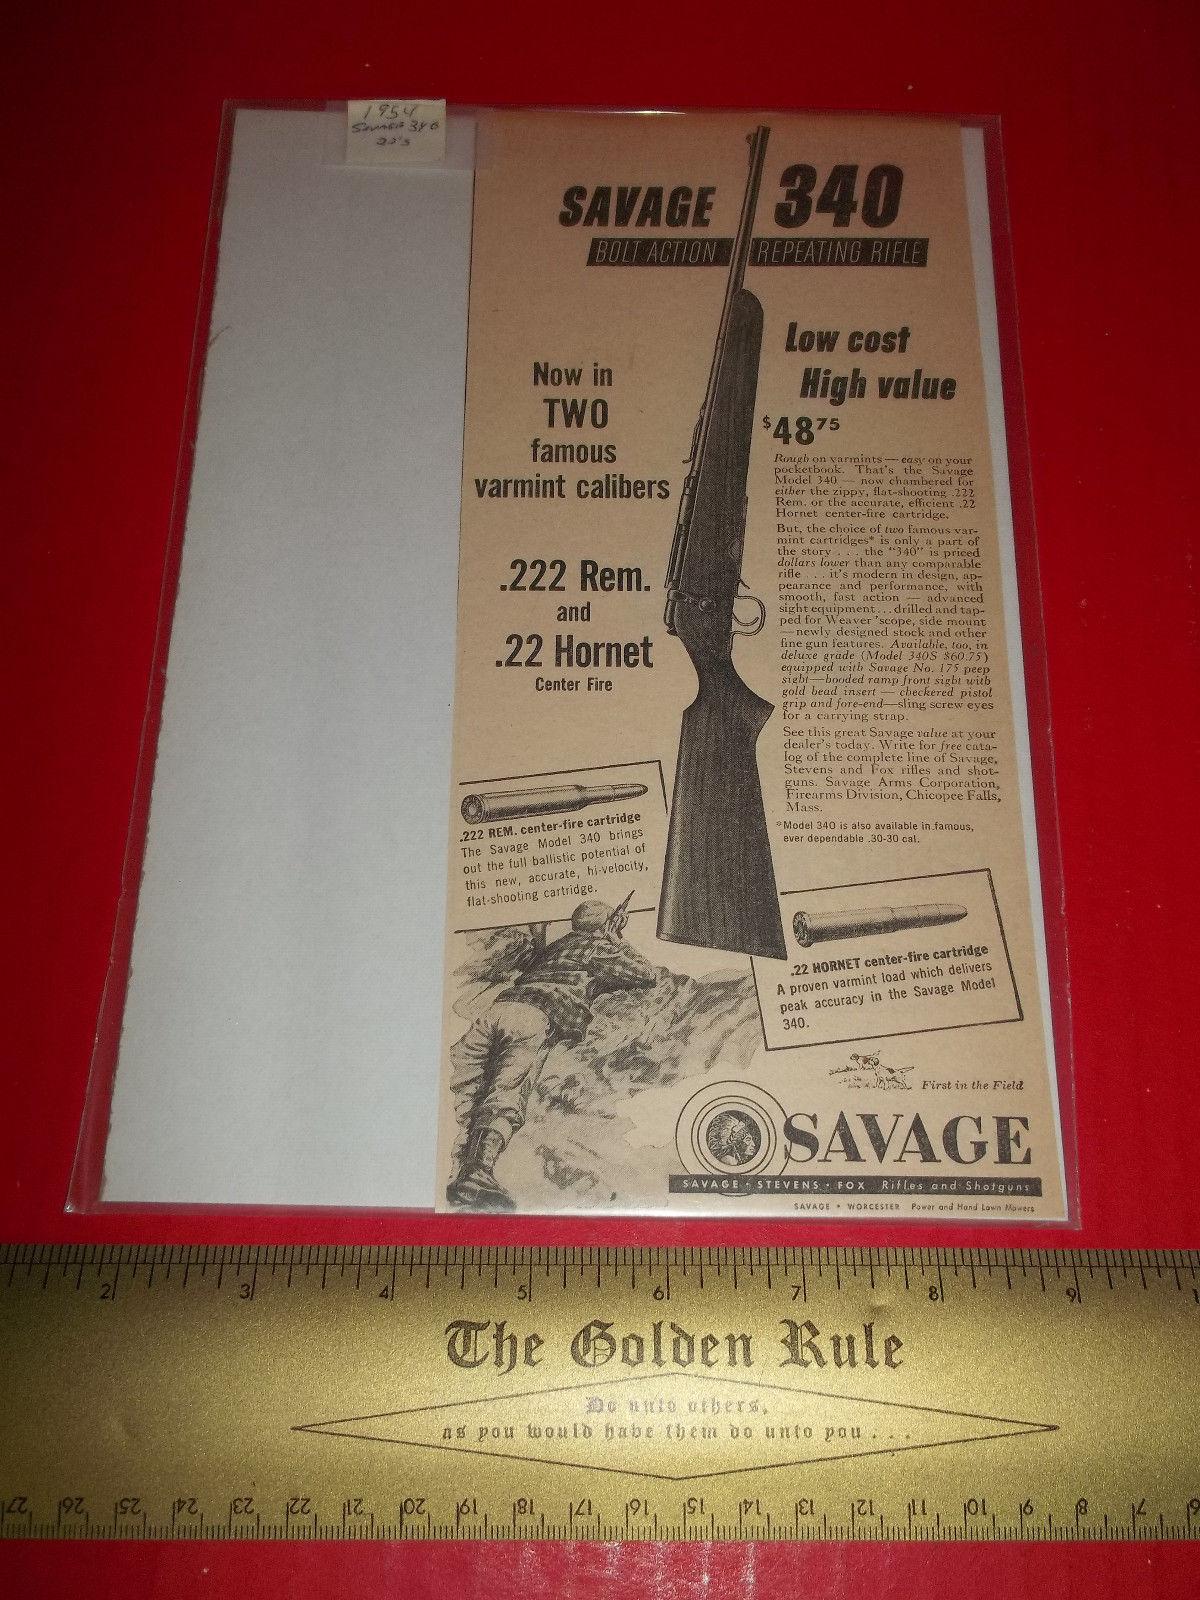 Home Treasure Paper Decor 1954 Savage 340 and 50 similar items